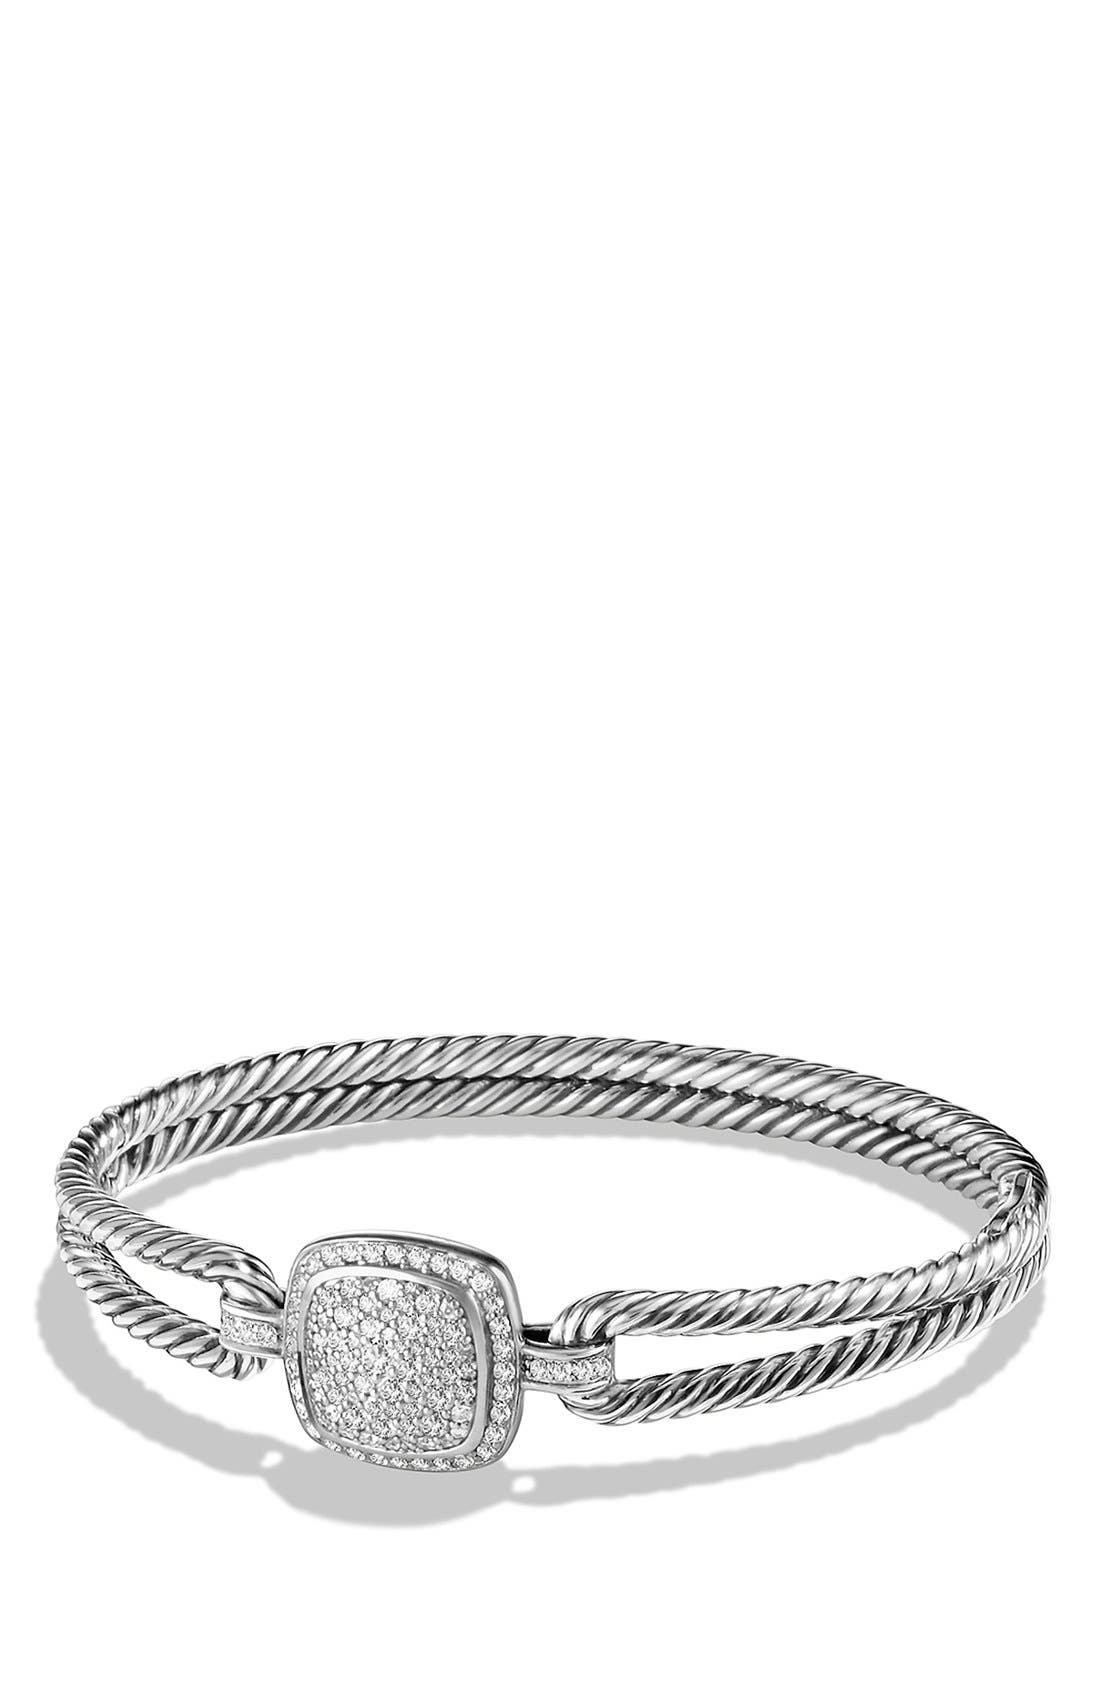 'Albion' Bracelet with Diamonds,                             Main thumbnail 1, color,                             DIAMOND